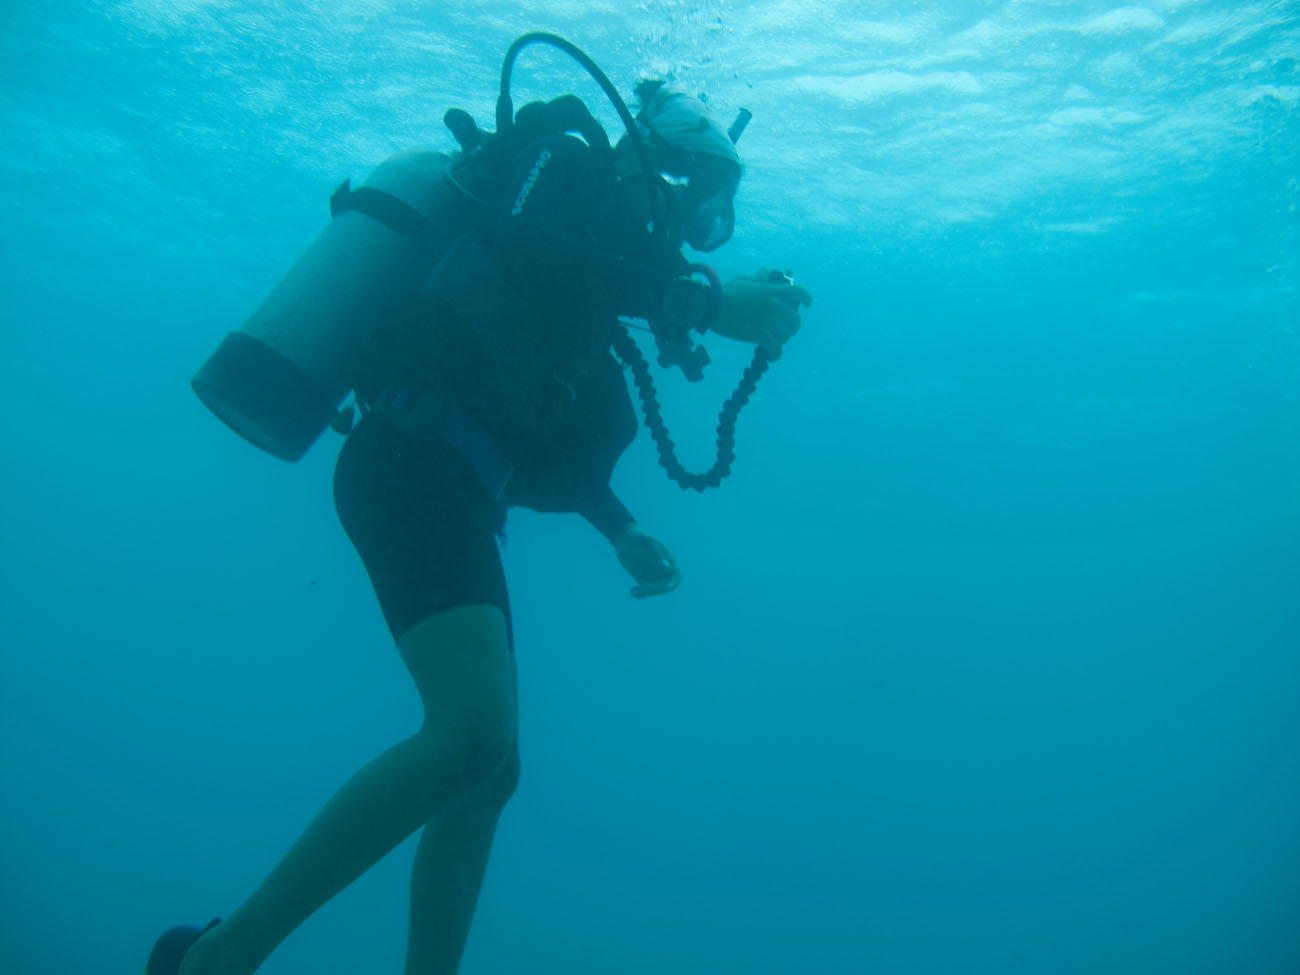 diving-044833